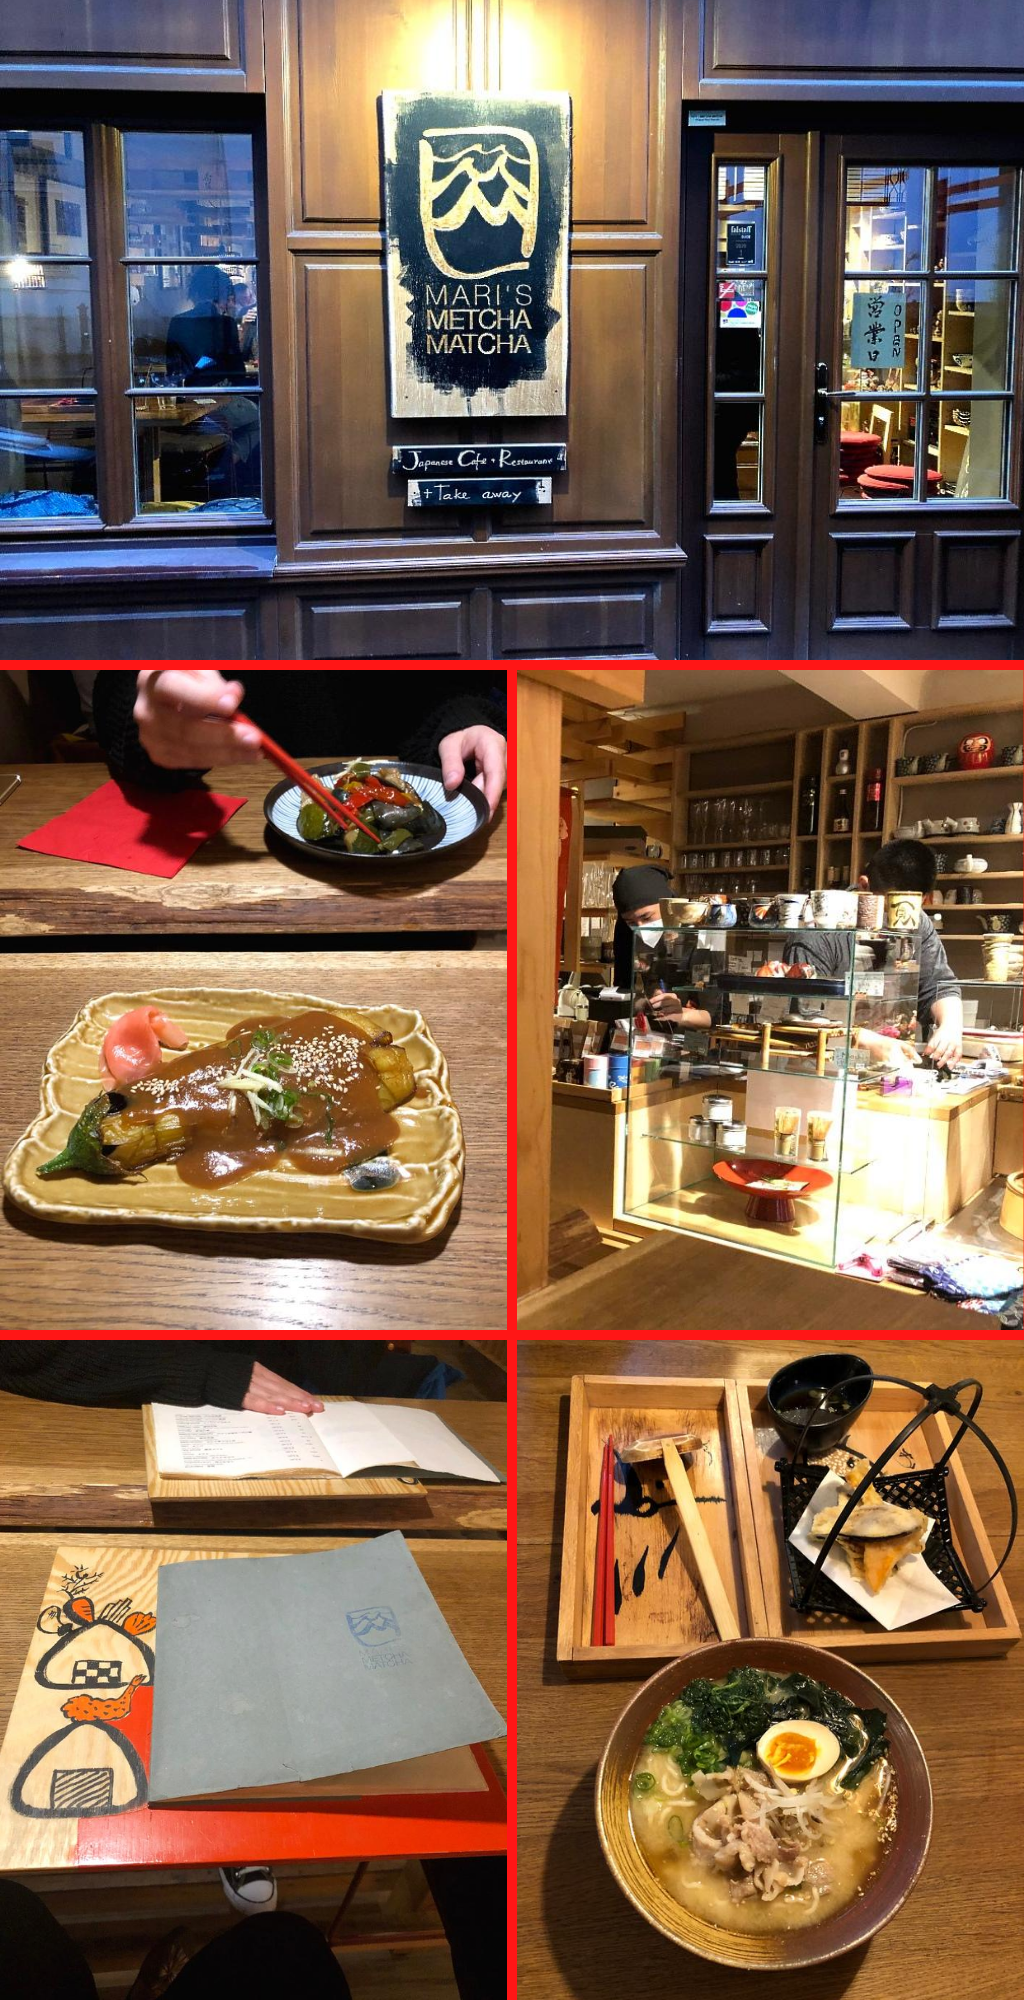 Wien kulinarisch: Mari's Metcha-Matcha